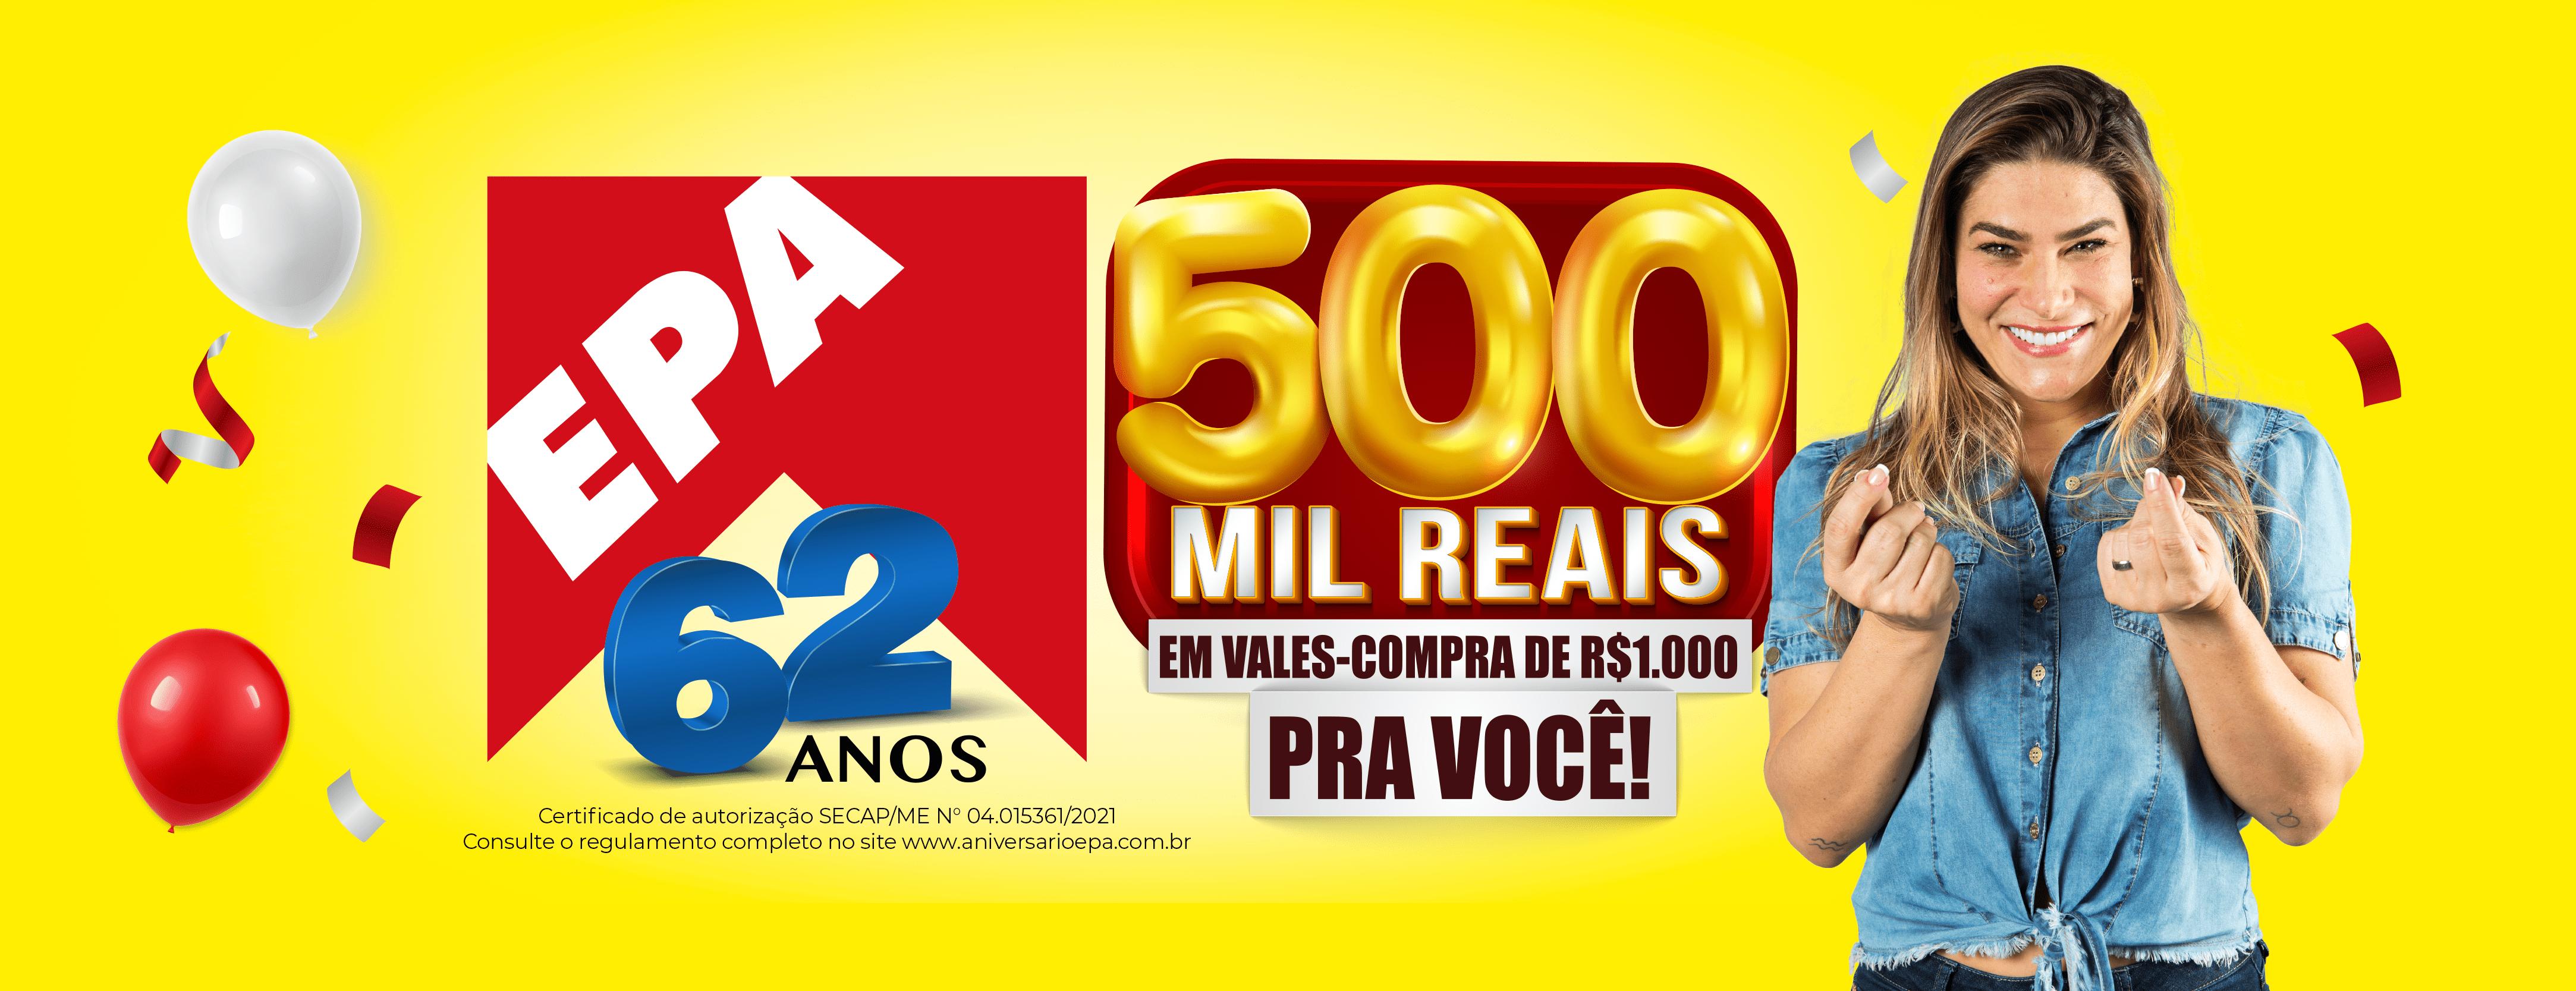 Aniversário Epa 500 Mil Reais em vales-compra pra você